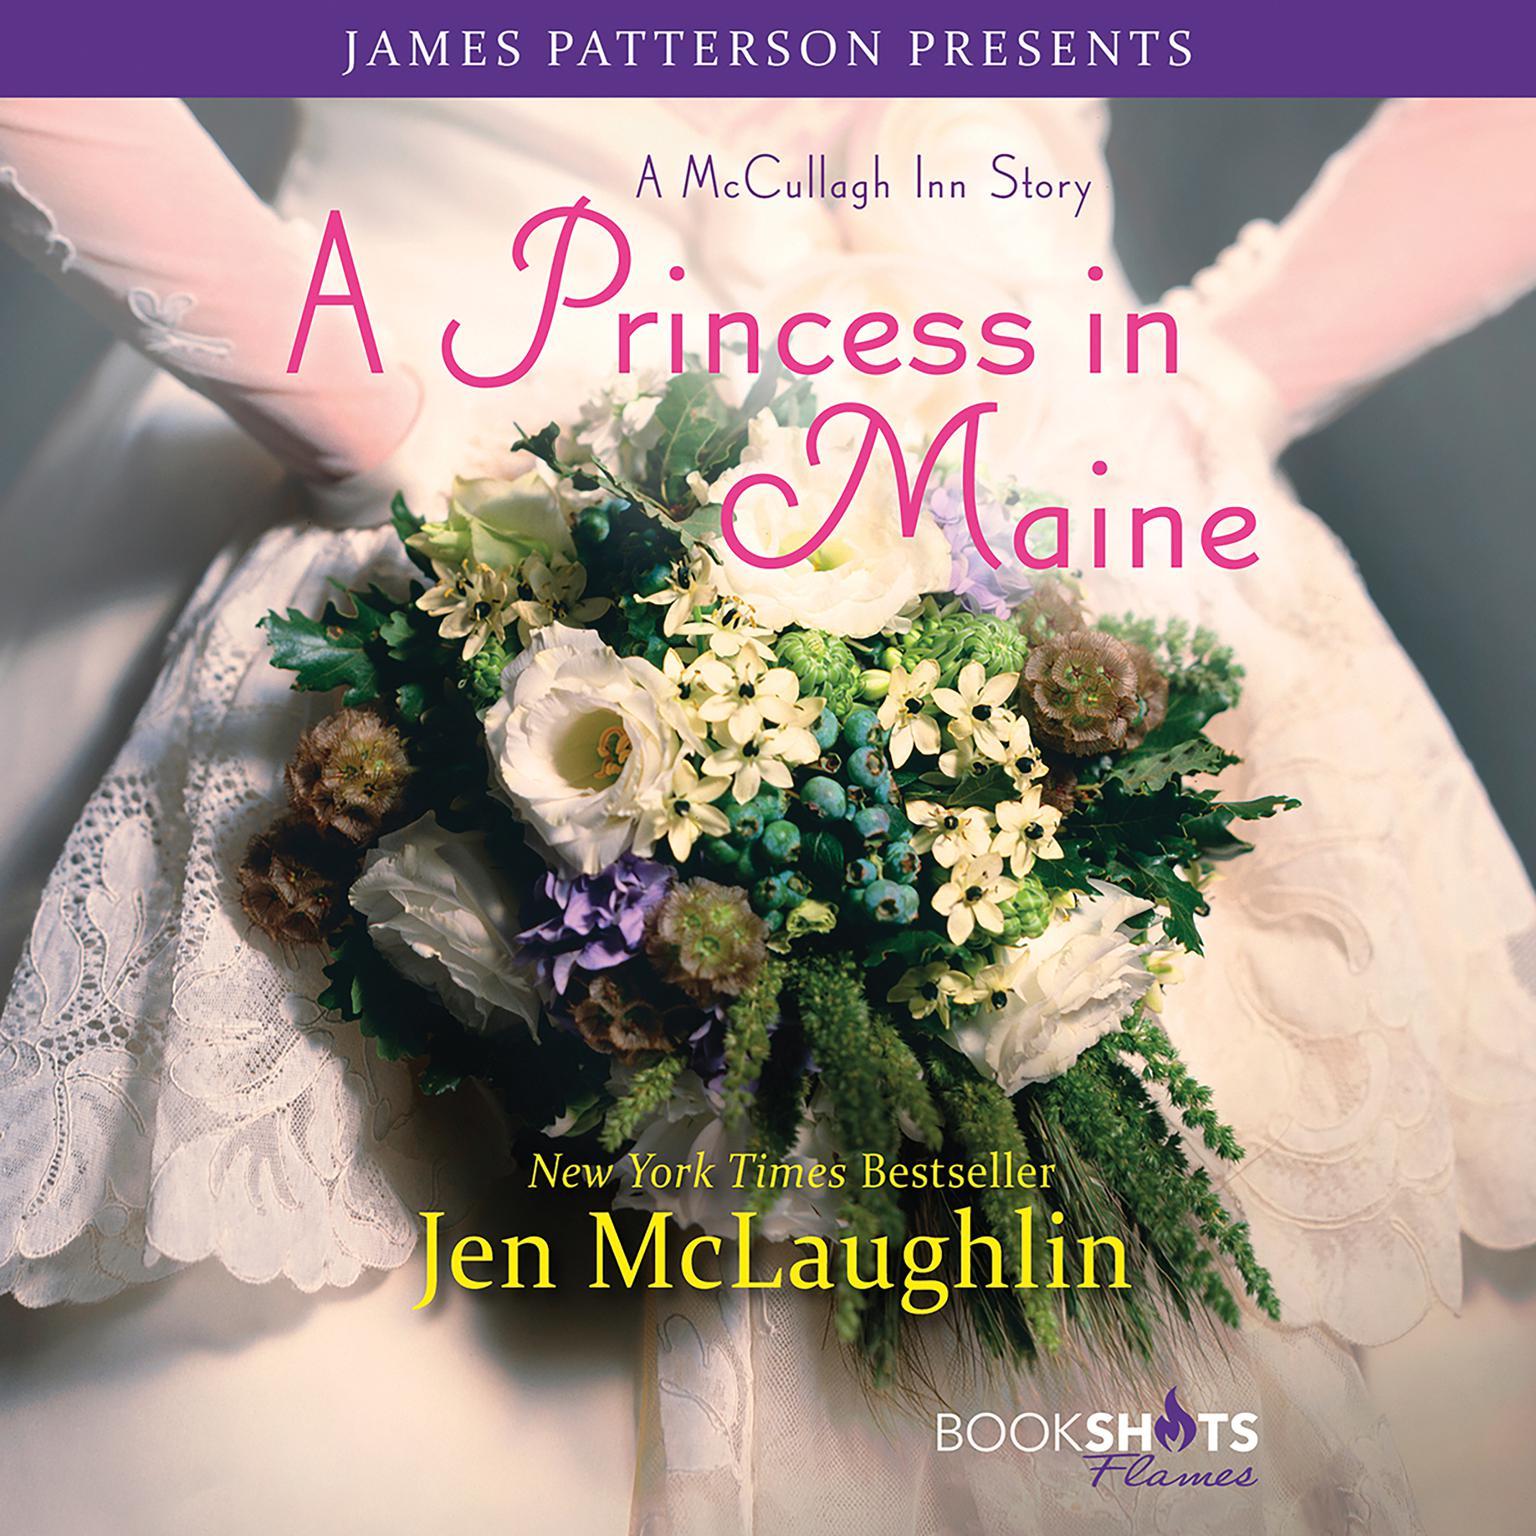 Printable A Princess in Maine: A McCullagh Inn Story Audiobook Cover Art